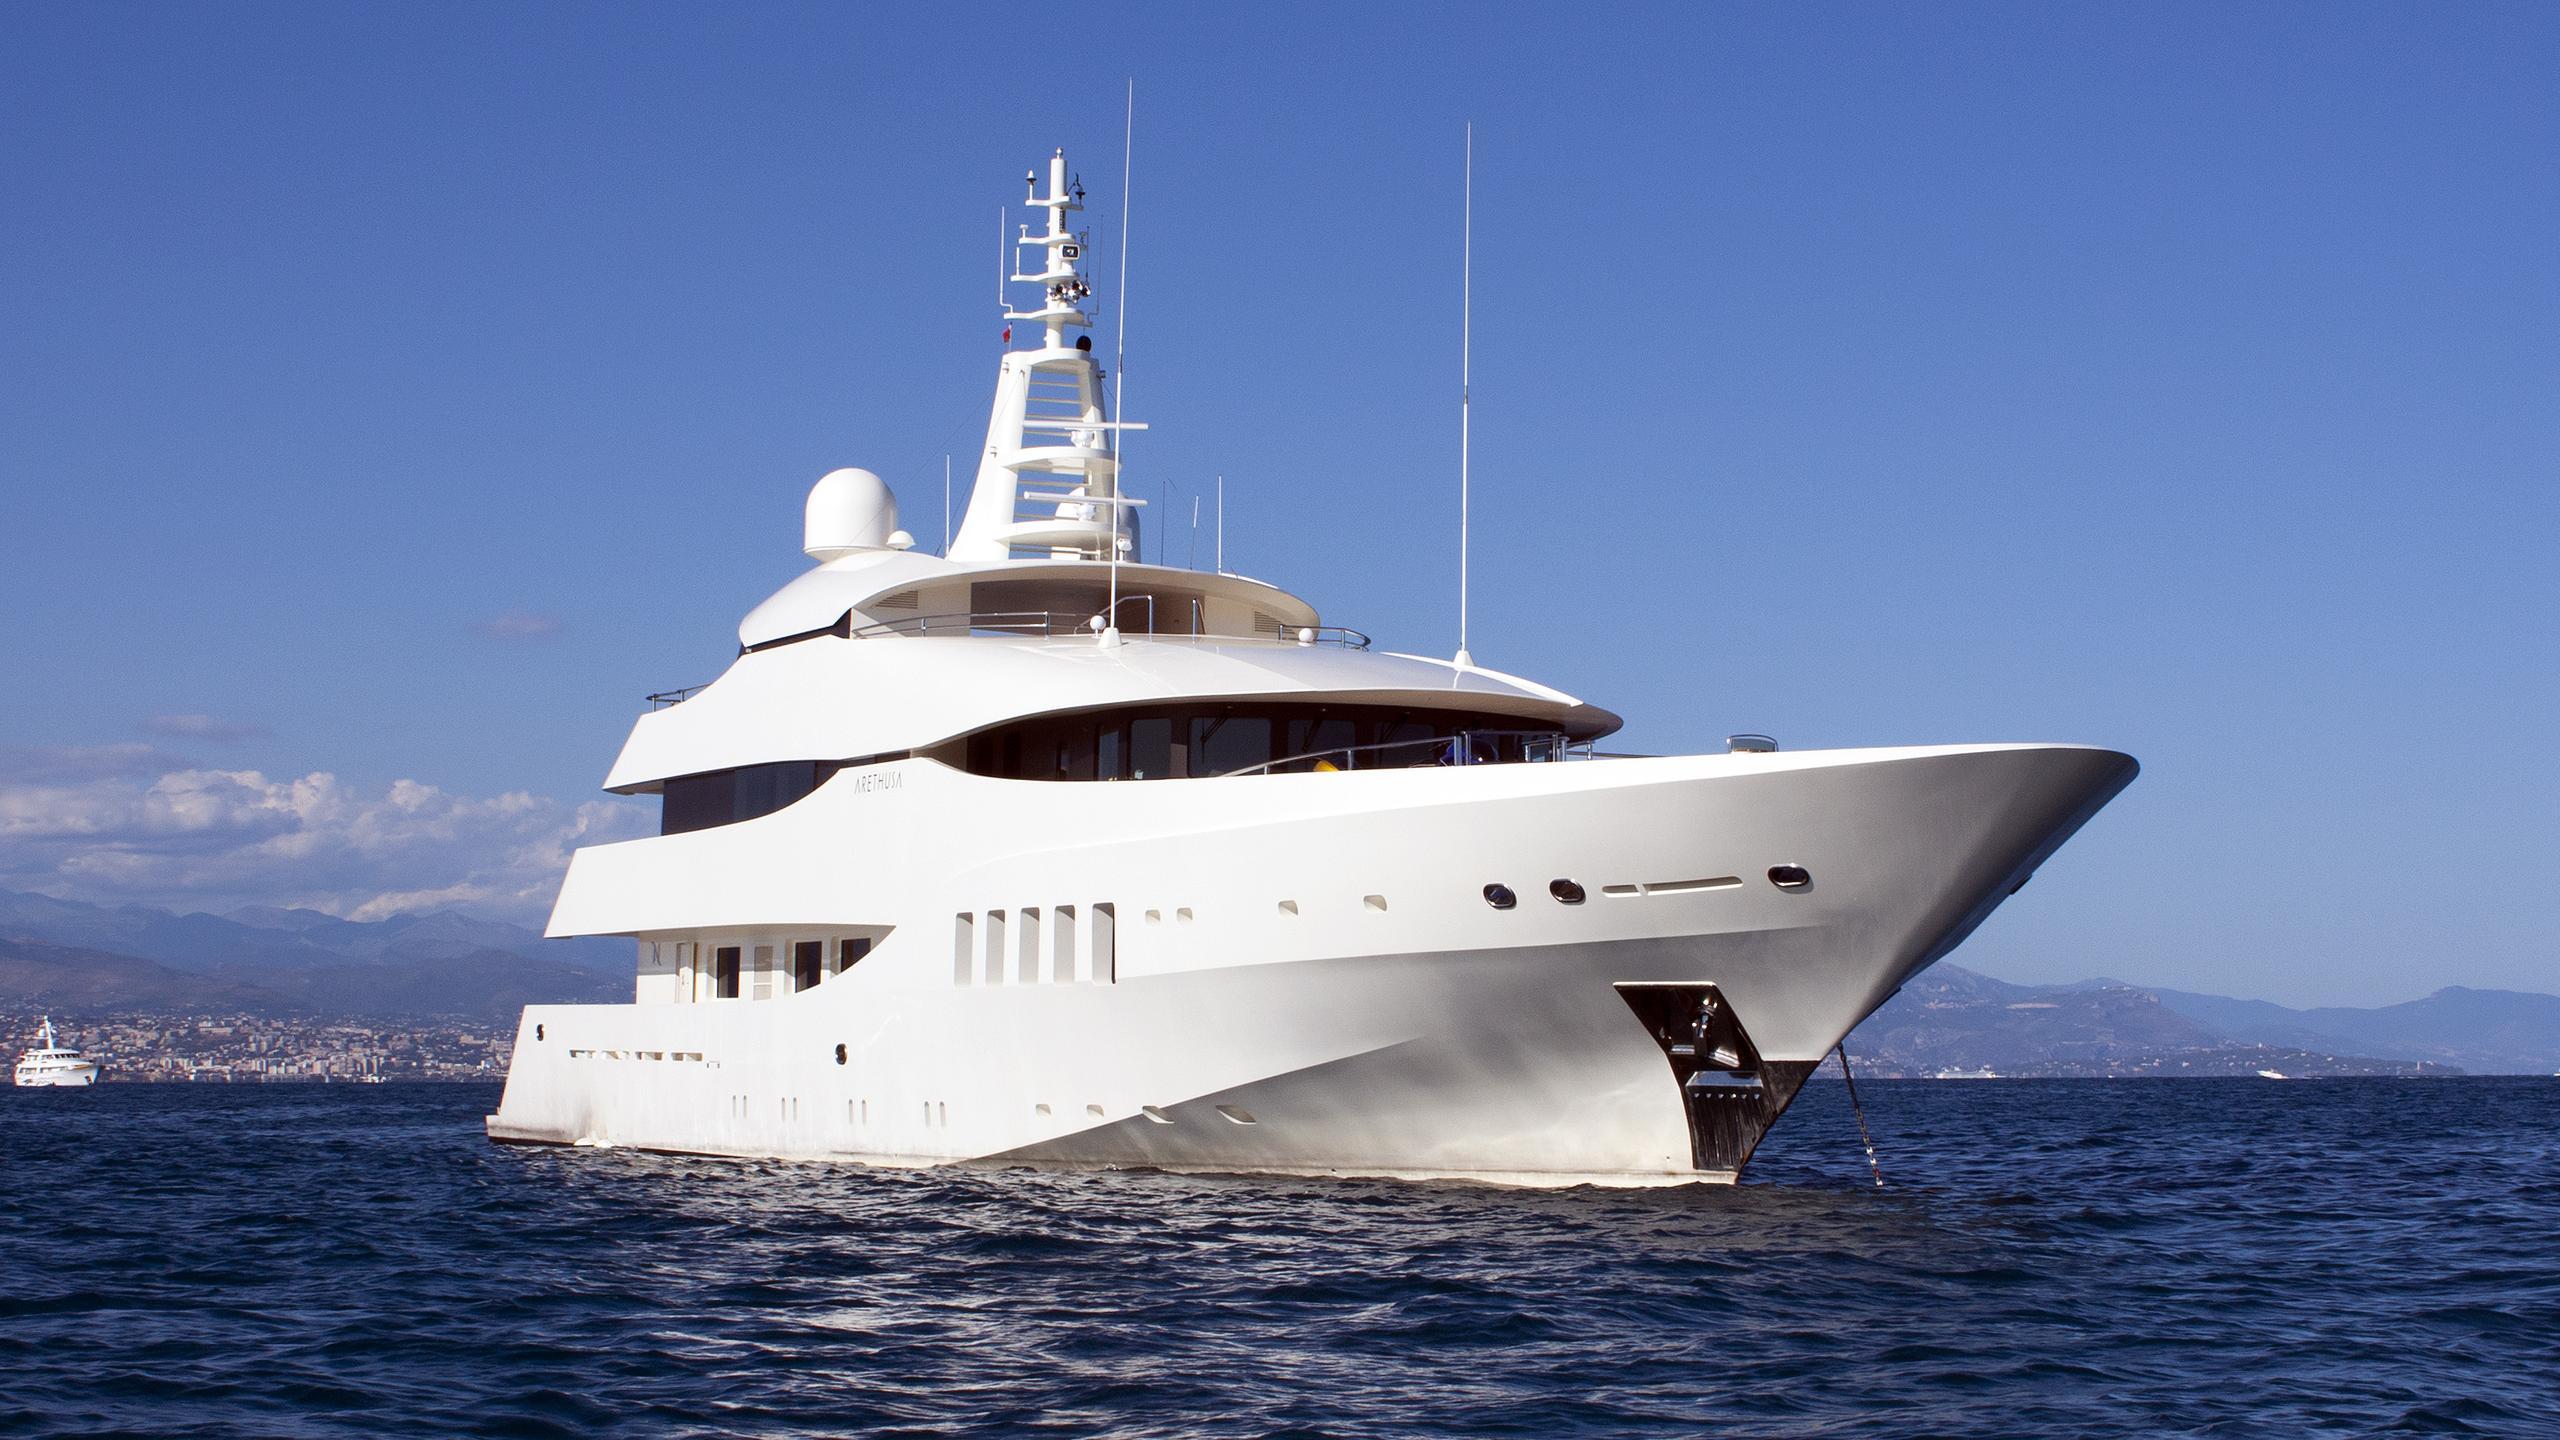 alkhor-motor-yacht-neereids-2008-47m-stern-before-refit